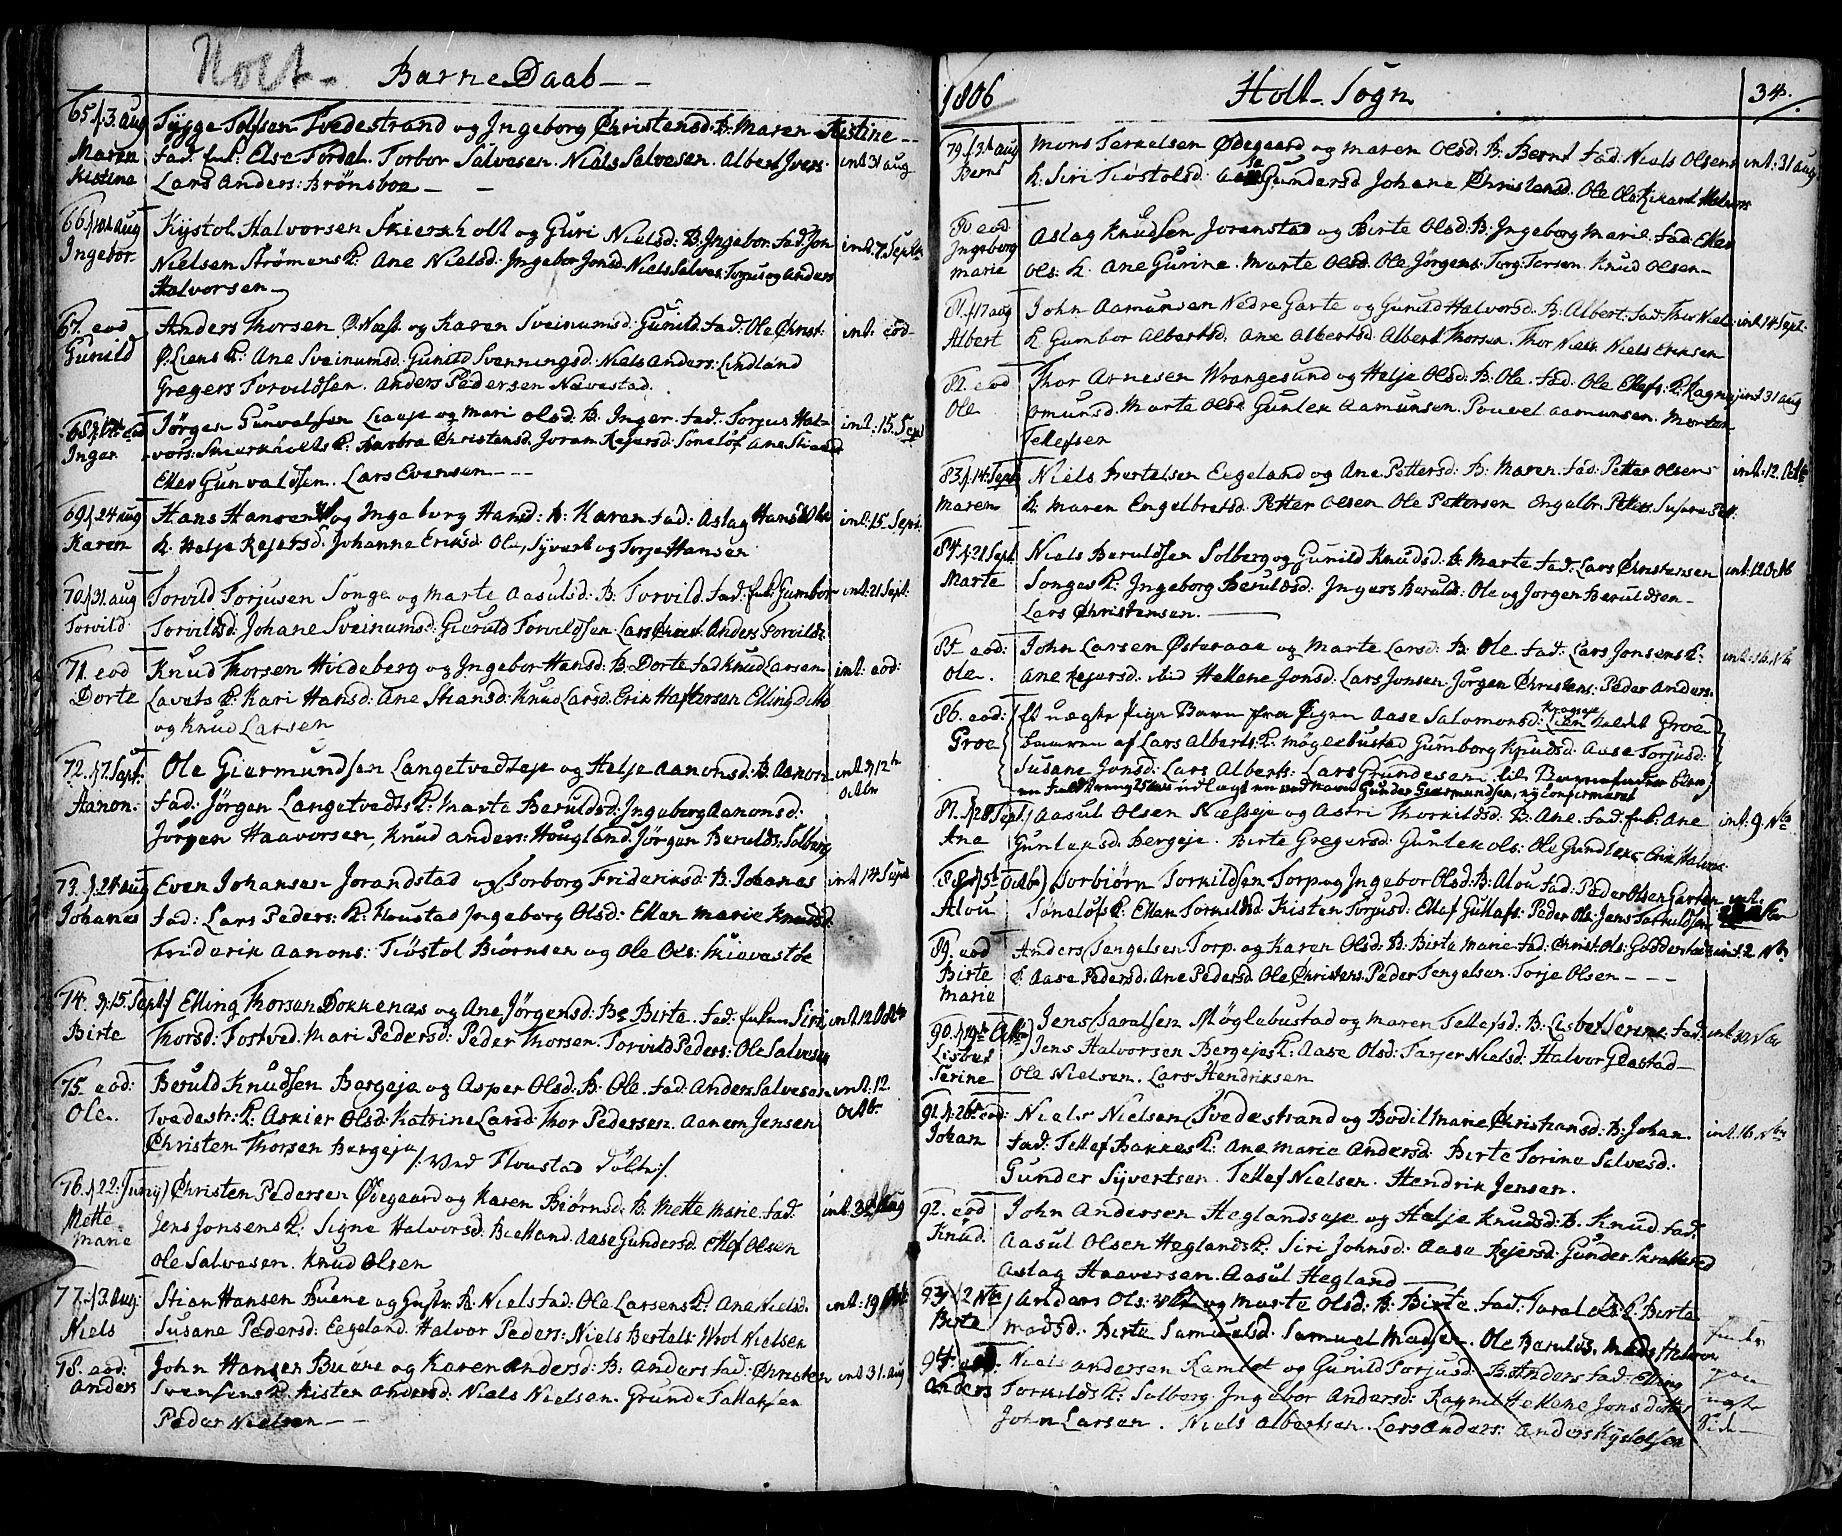 SAK, Holt sokneprestkontor, F/Fa/L0004: Ministerialbok nr. A 4, 1799-1813, s. 34